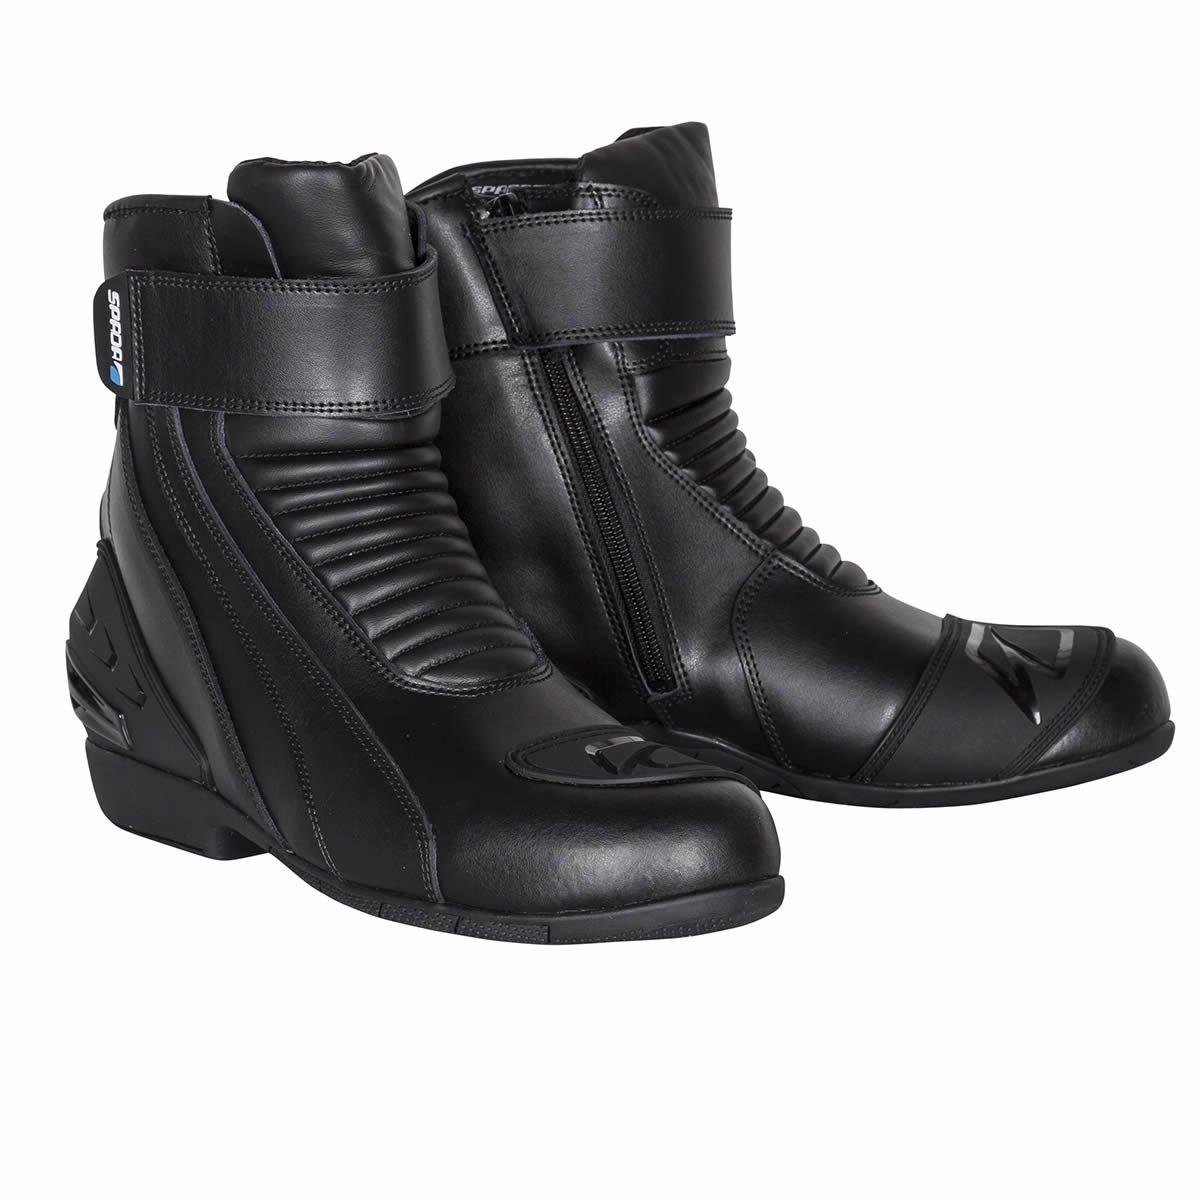 Spada Icon WP Boots Black W-17637807c3f9c80570ce0d523c42986f